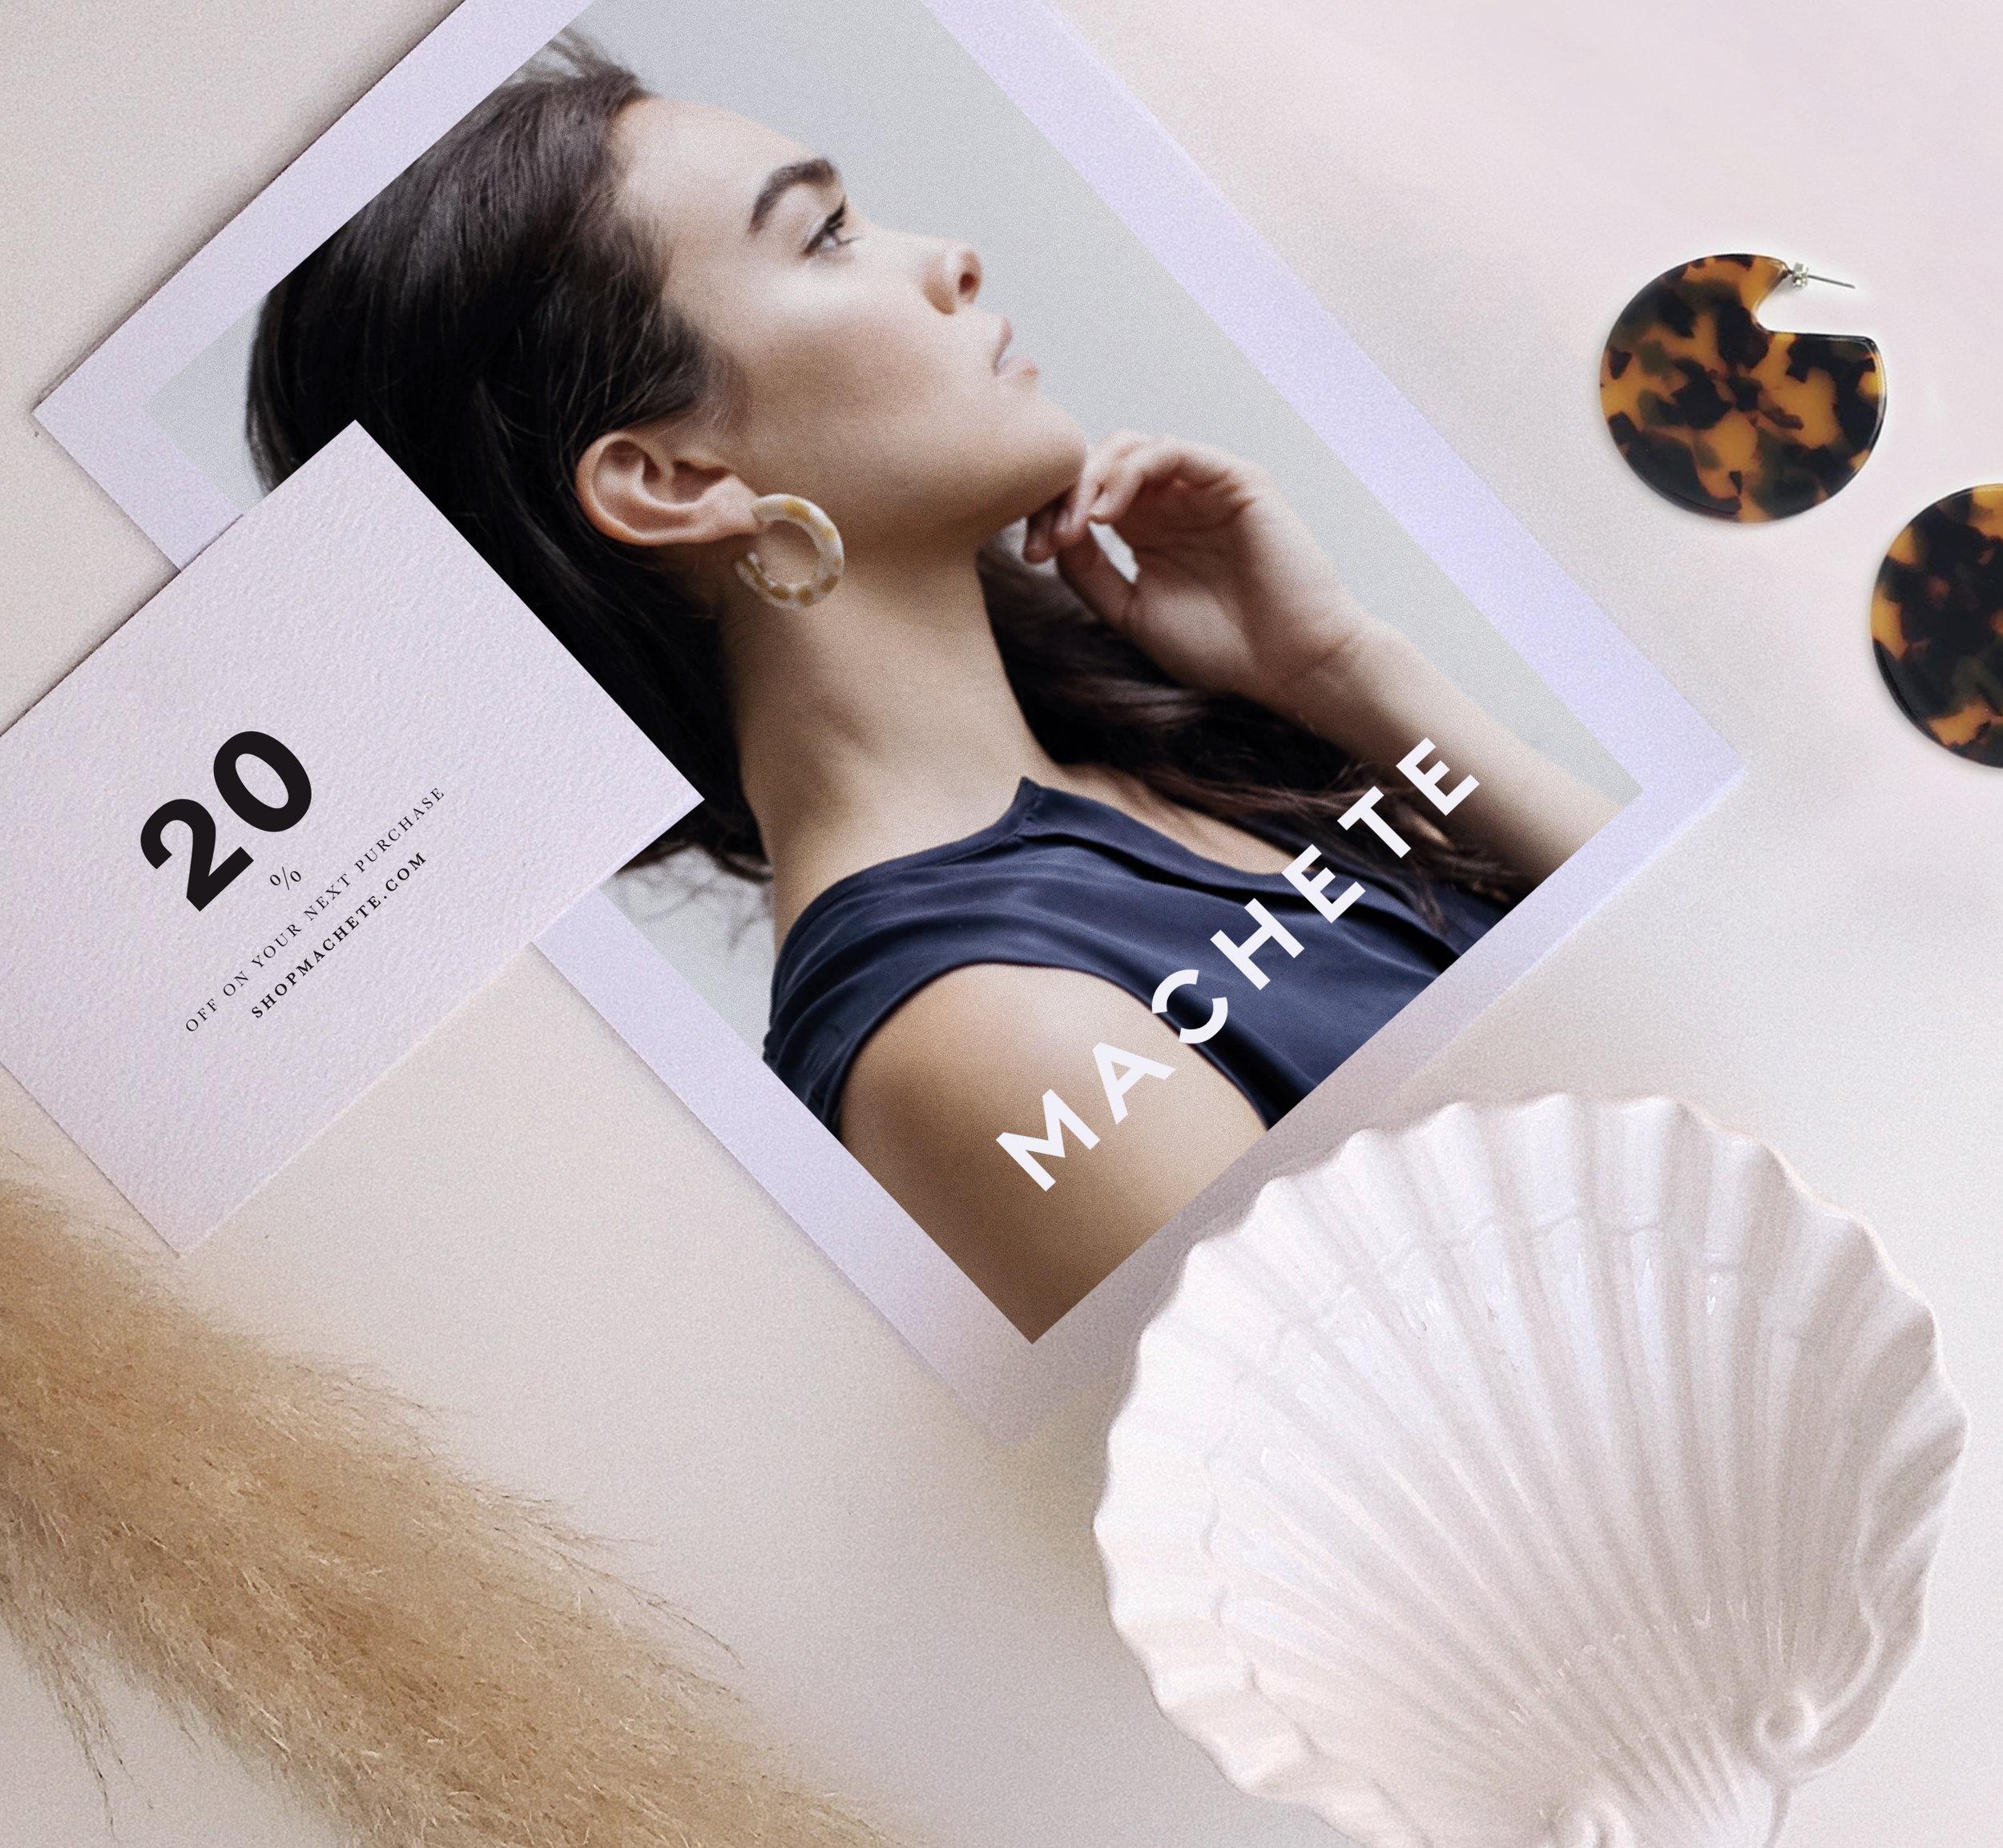 machete-jewelry-branding-1v2-loolaa-designs.jpg